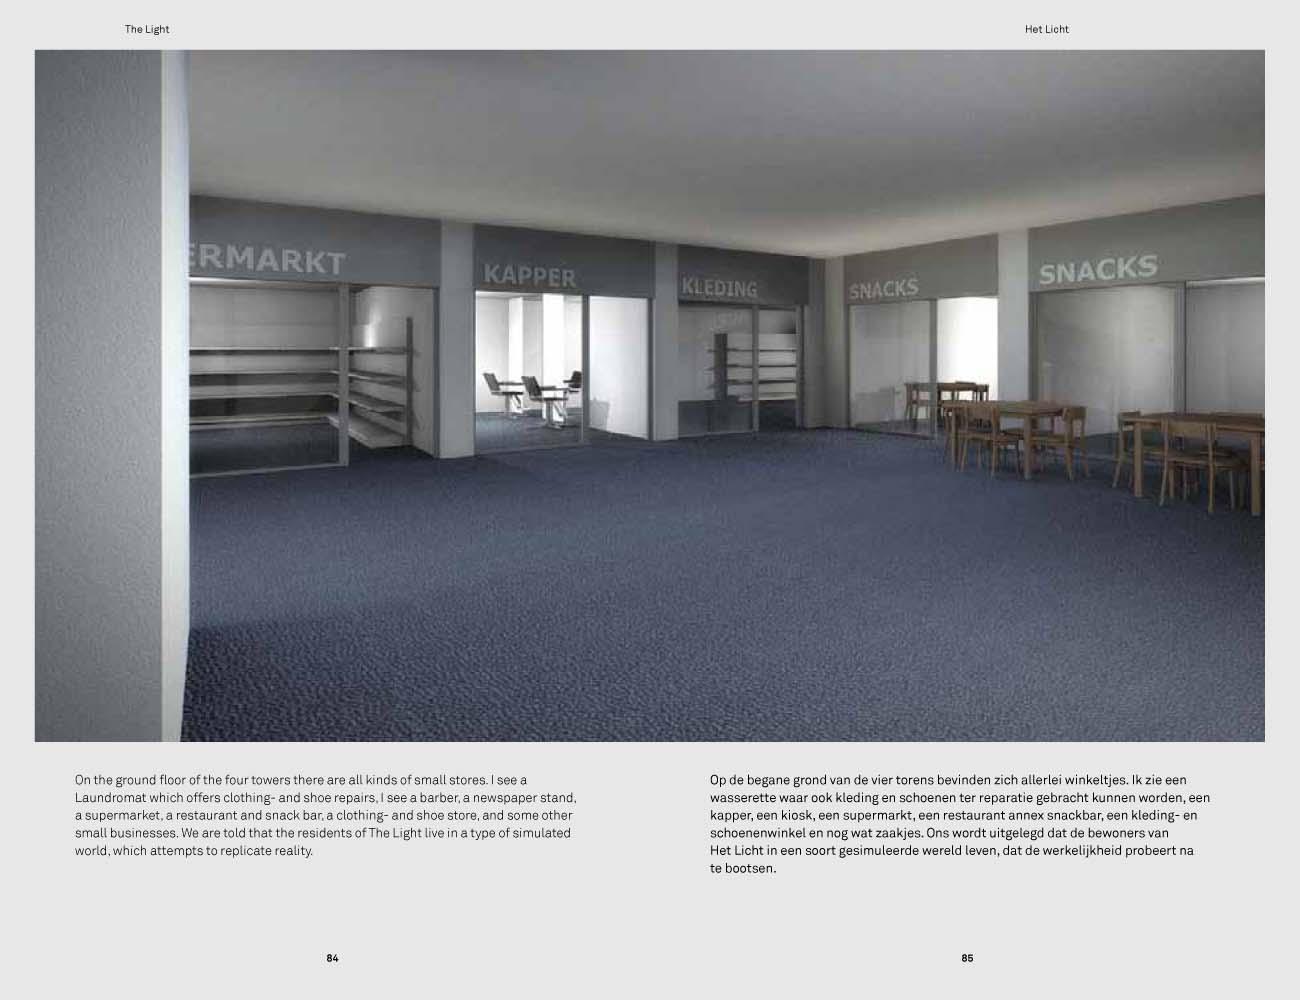 Jonas Staal - Fleur Agema's prison project 10